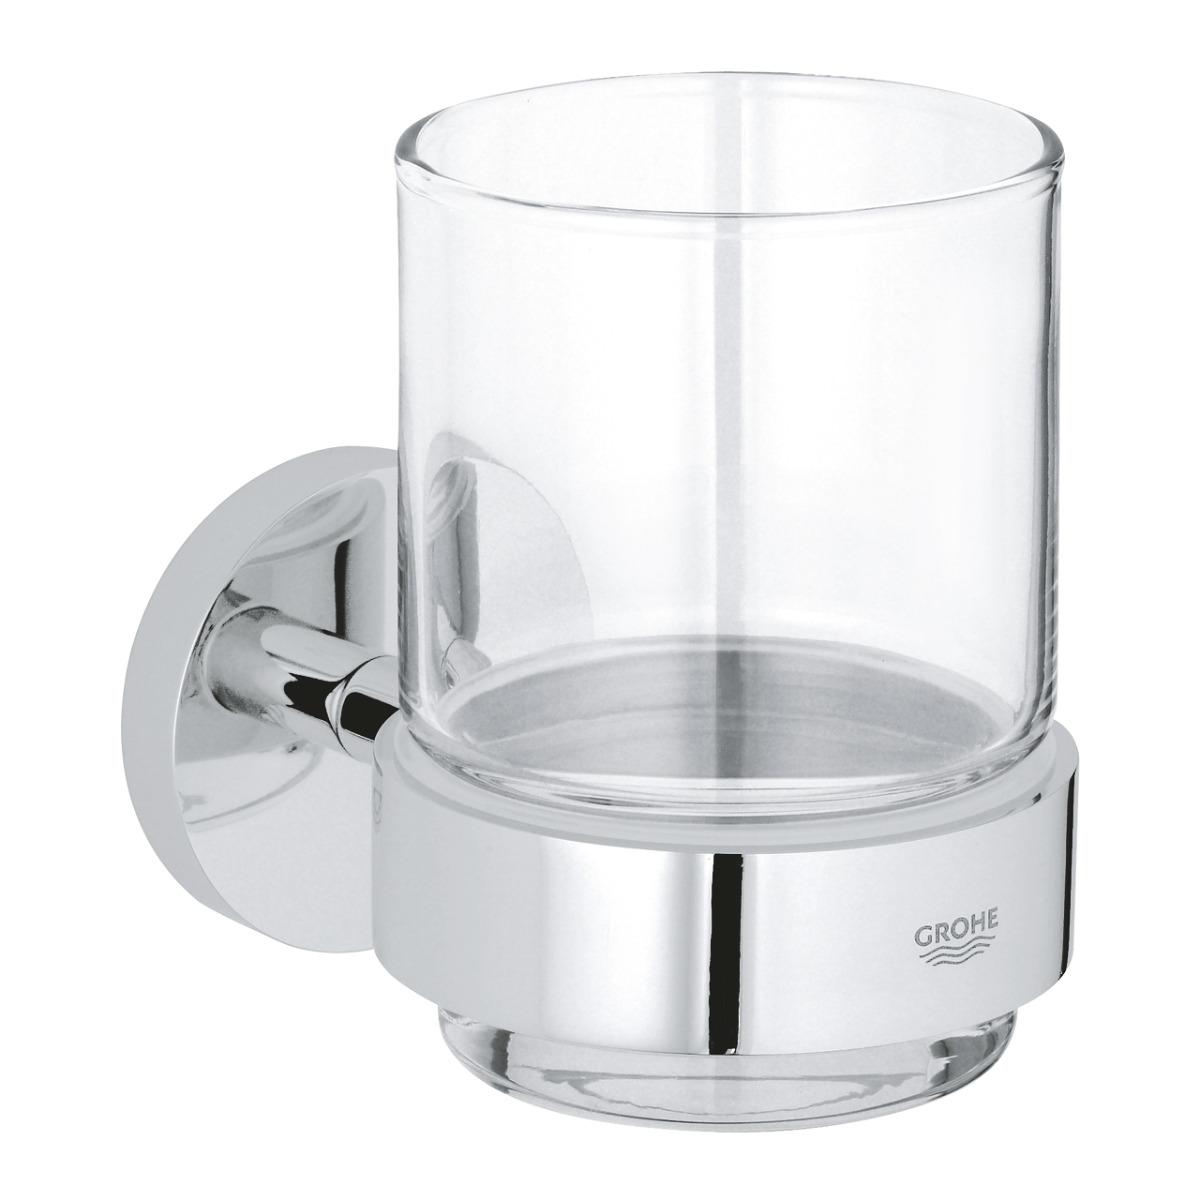 Pahar baie cu suport inclus Grohe Essentials-40447001 imagine